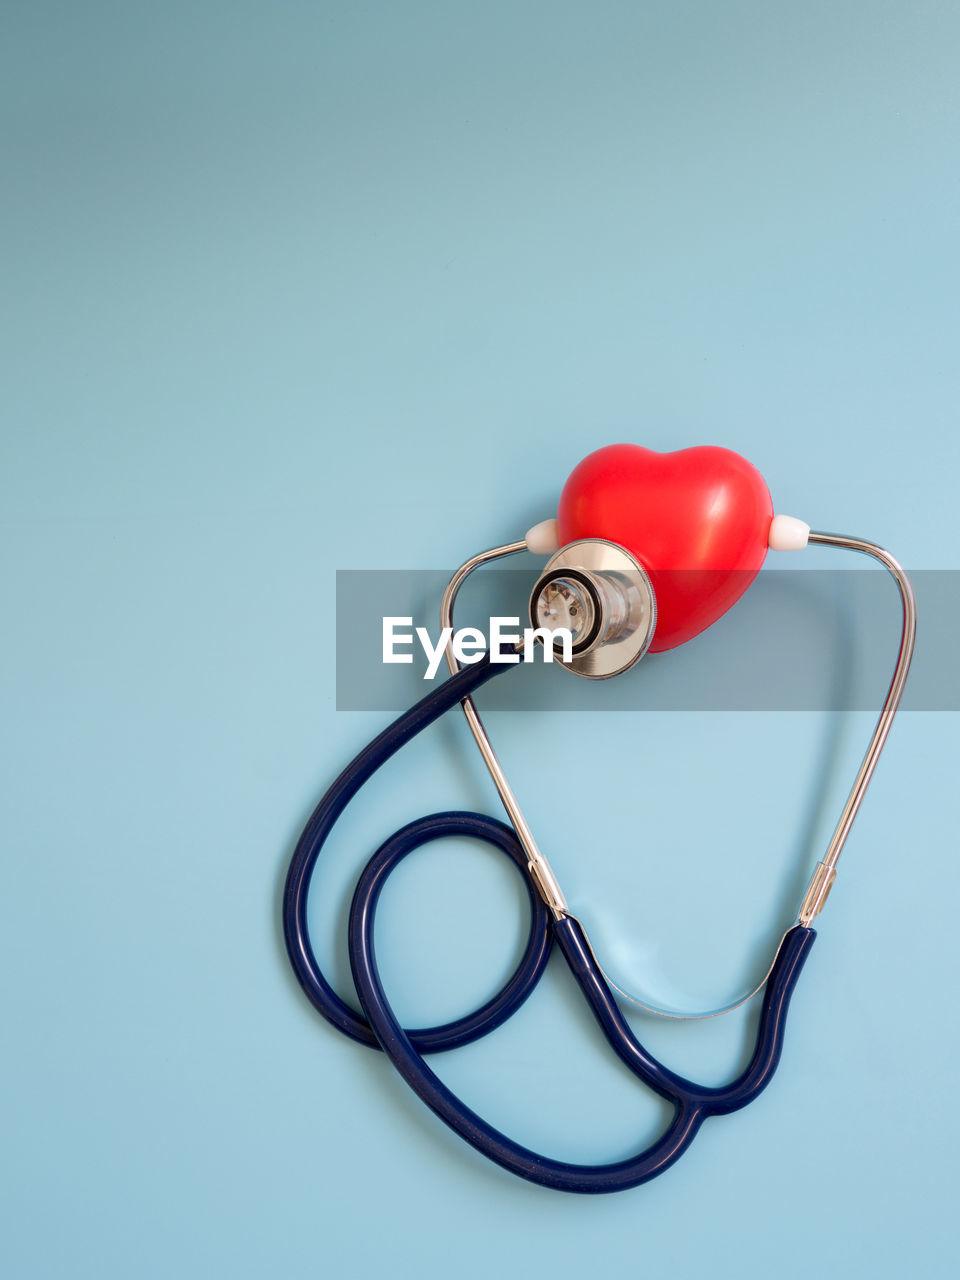 Stethoscope against blue background